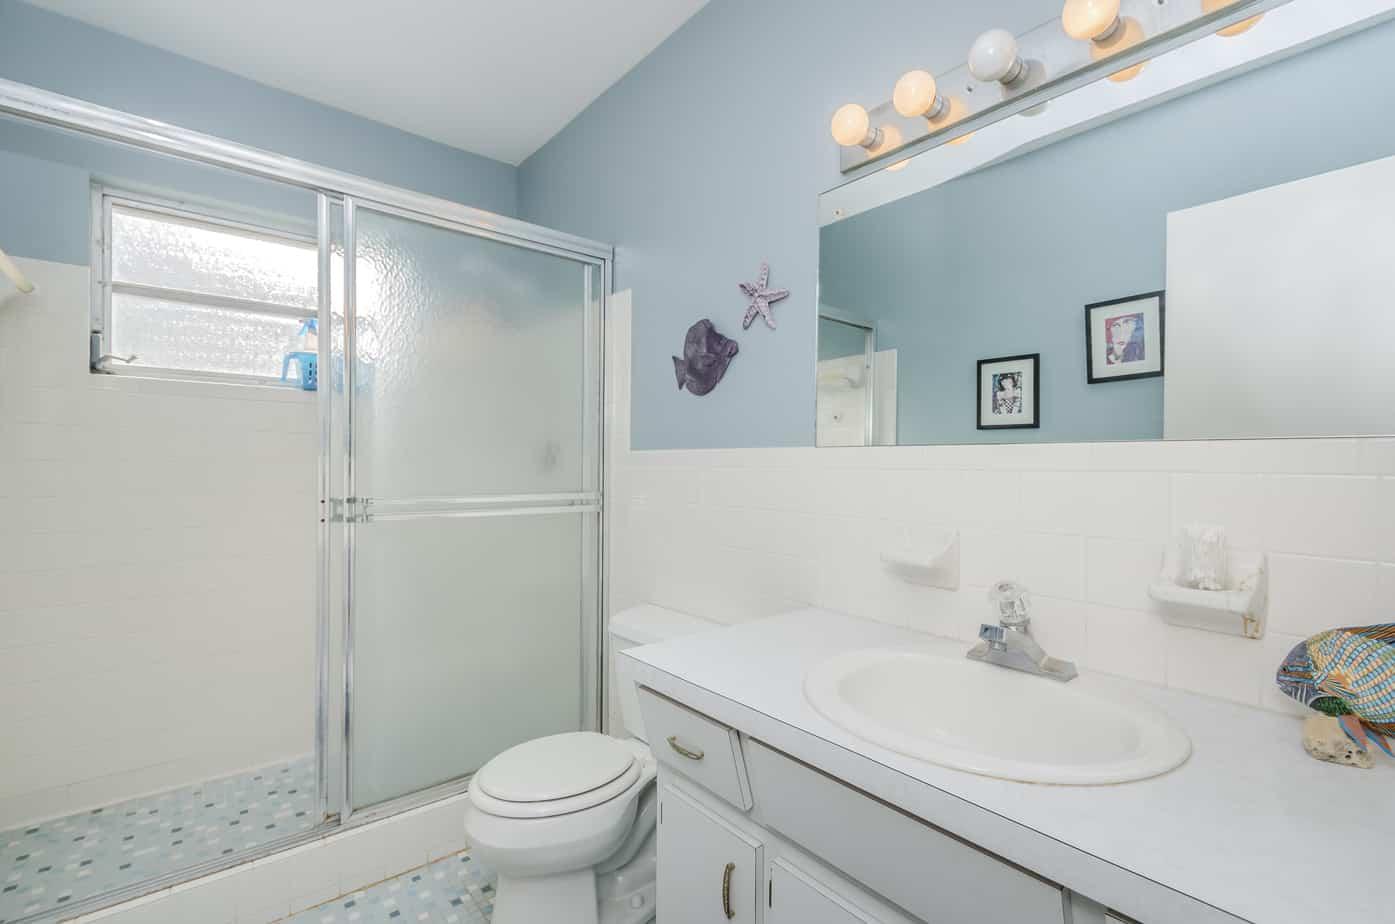 9-2285-Israeli-Dr-#17-Clearwater-Fl-33763-Master Bathroom